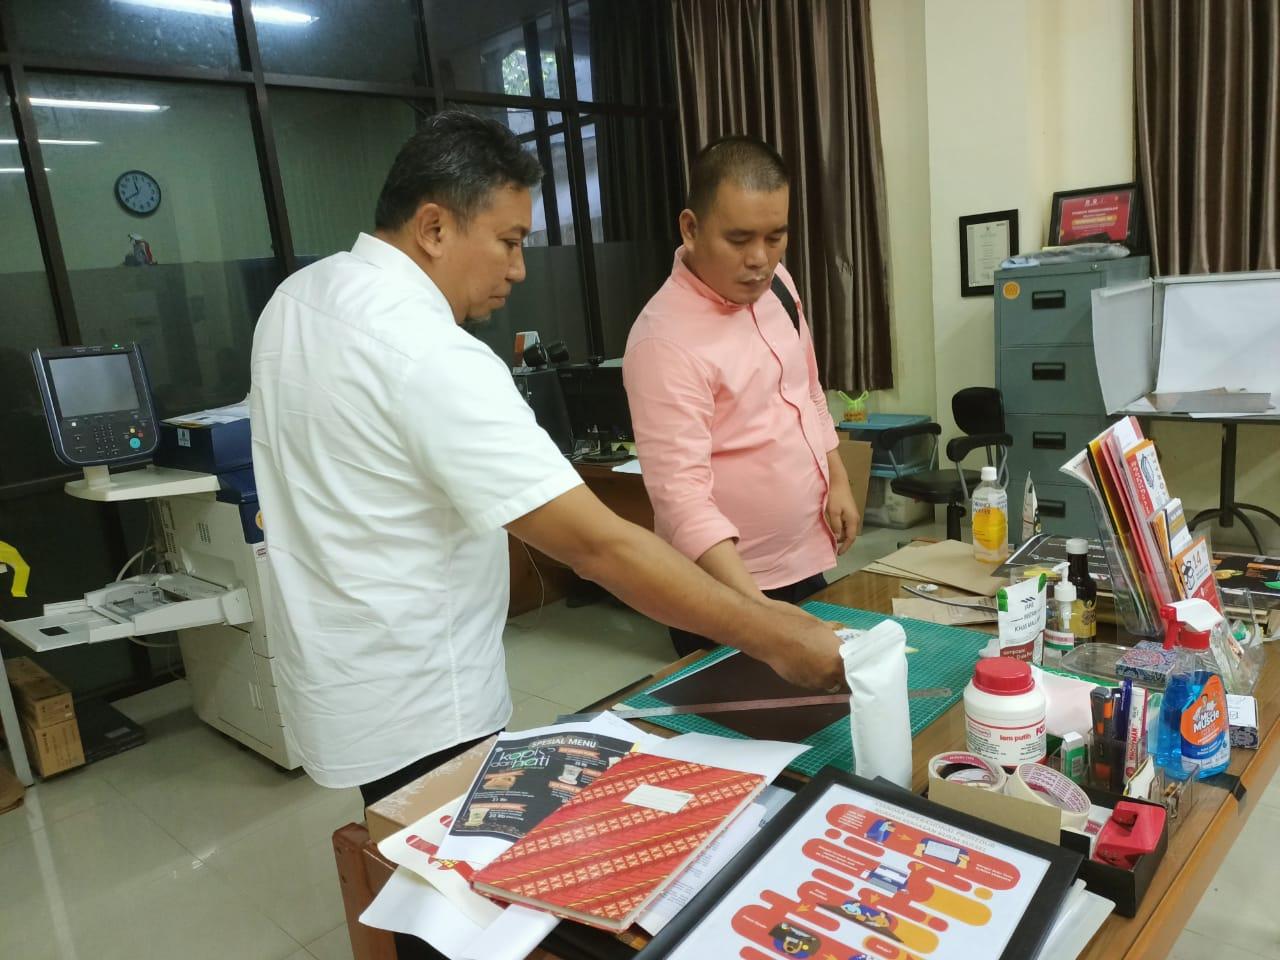 Majukan UKM Daerah, DPRD Merencanakan Buat Rumah Kemasan di Luwu Utara